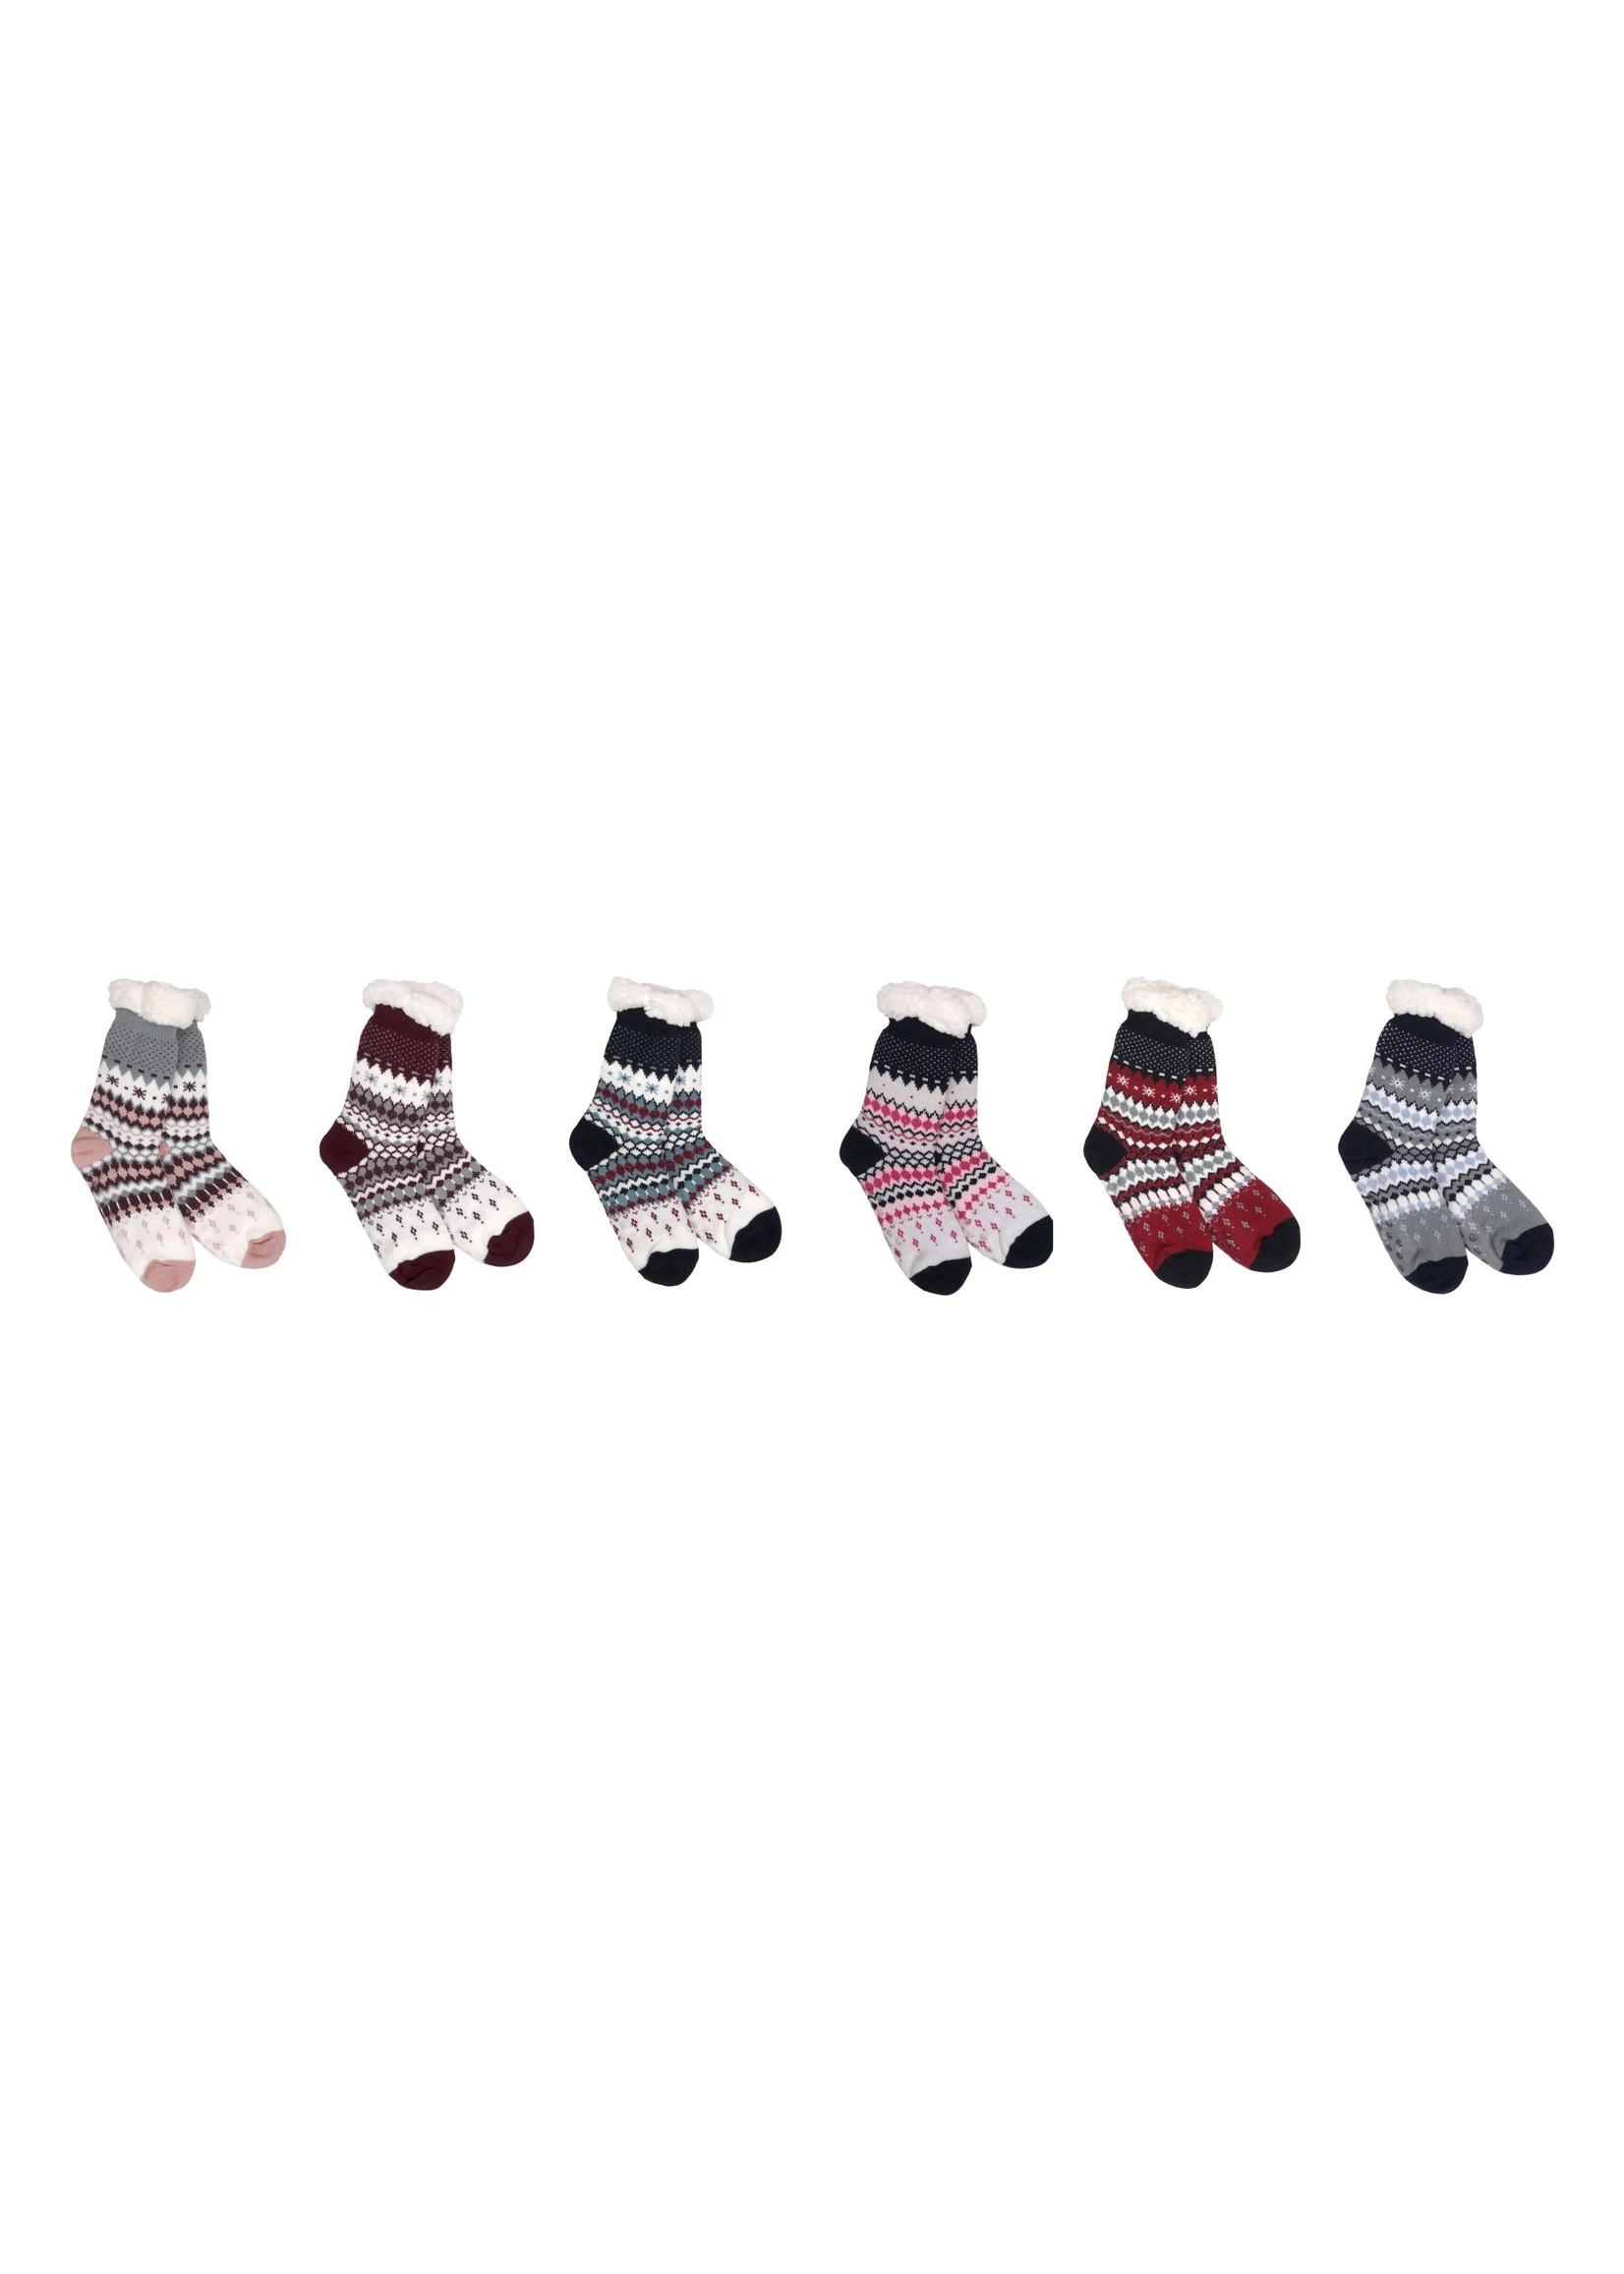 Fashion by Mirabeau Swiss Alpine Thermal Slipper Socks, Asst